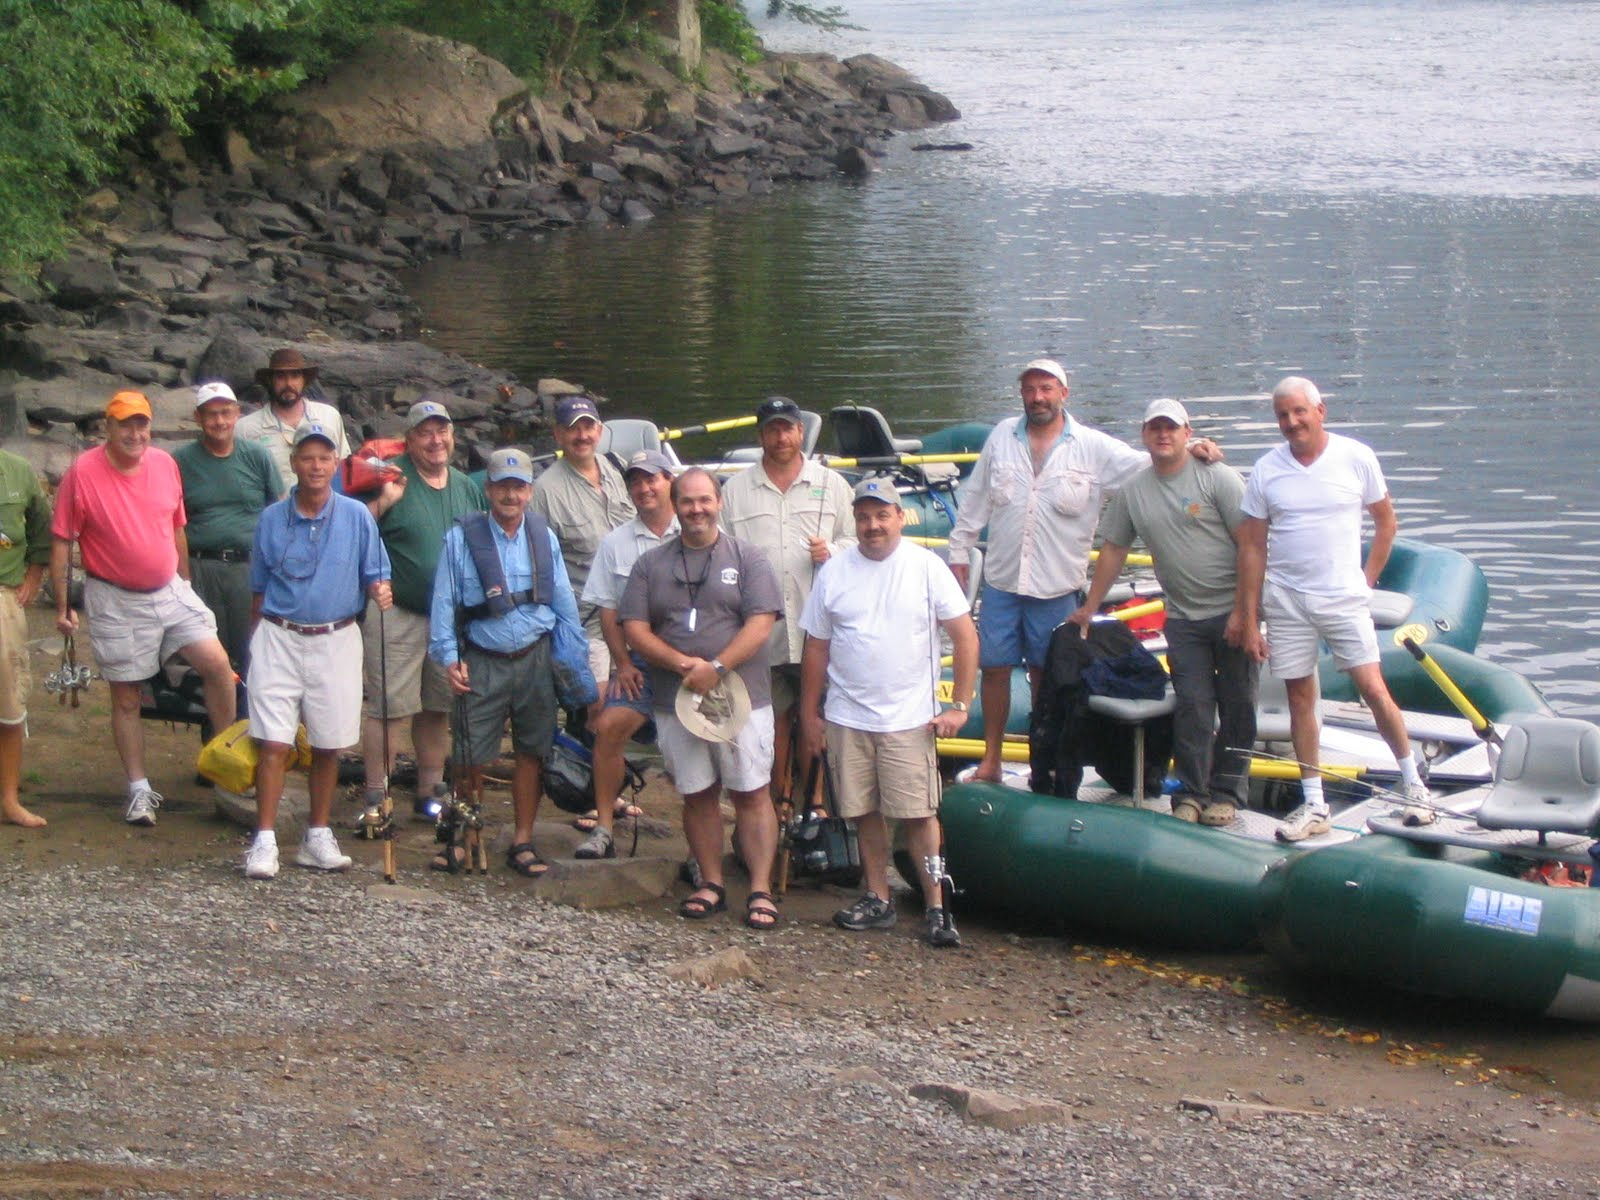 West virginia fishing west virginia fishing guide service for West virginia fishing